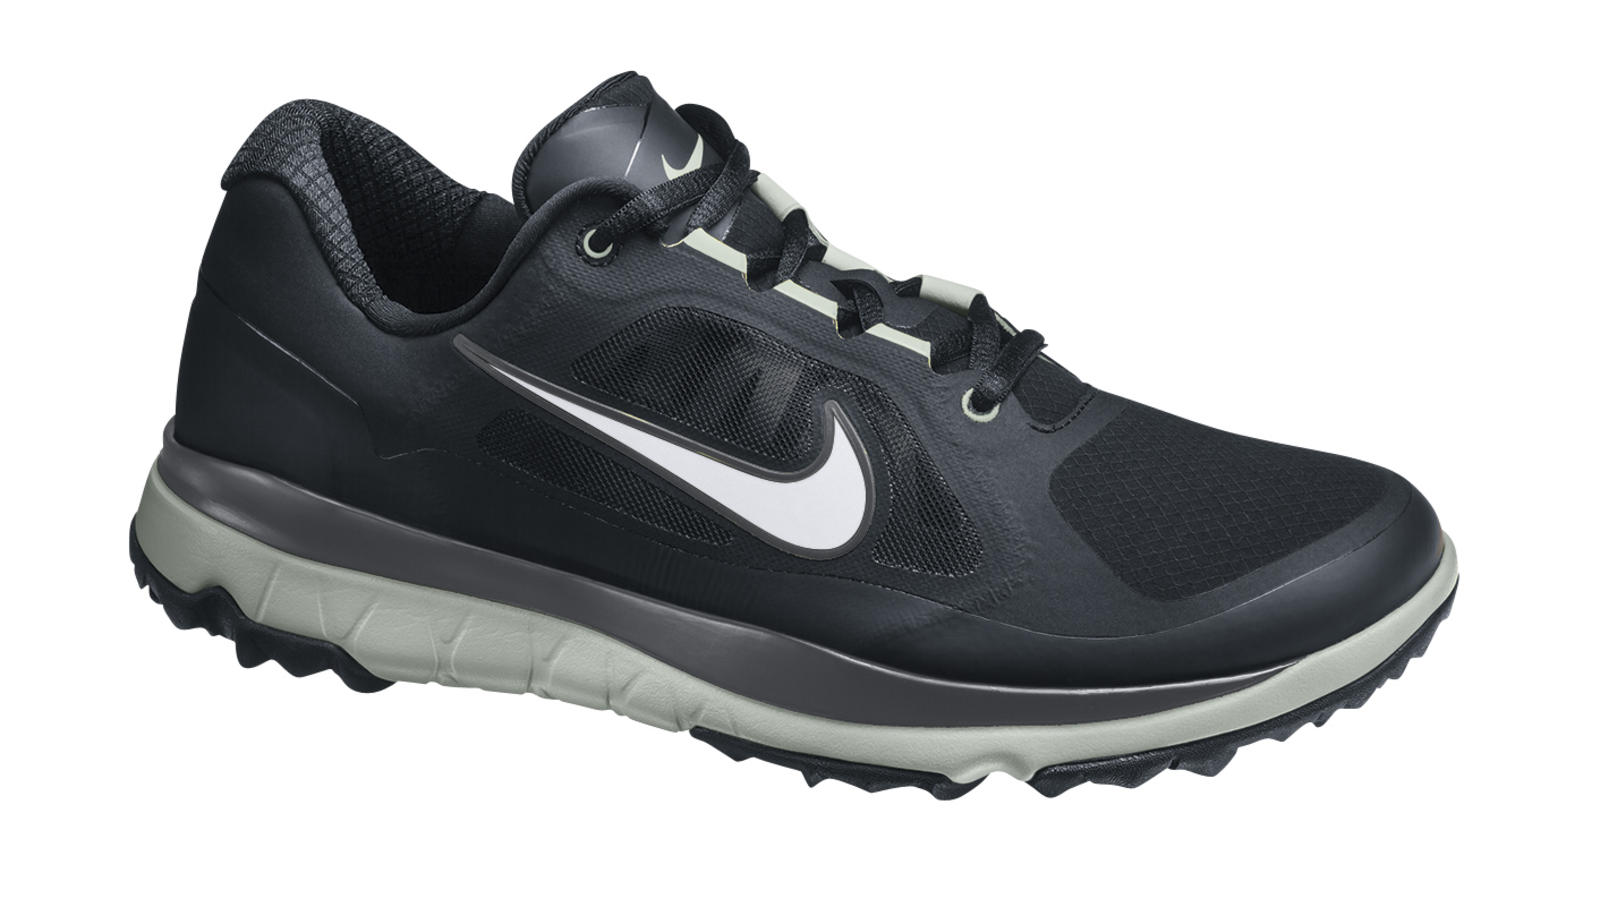 Inspired Footwear: Nike FI Impact